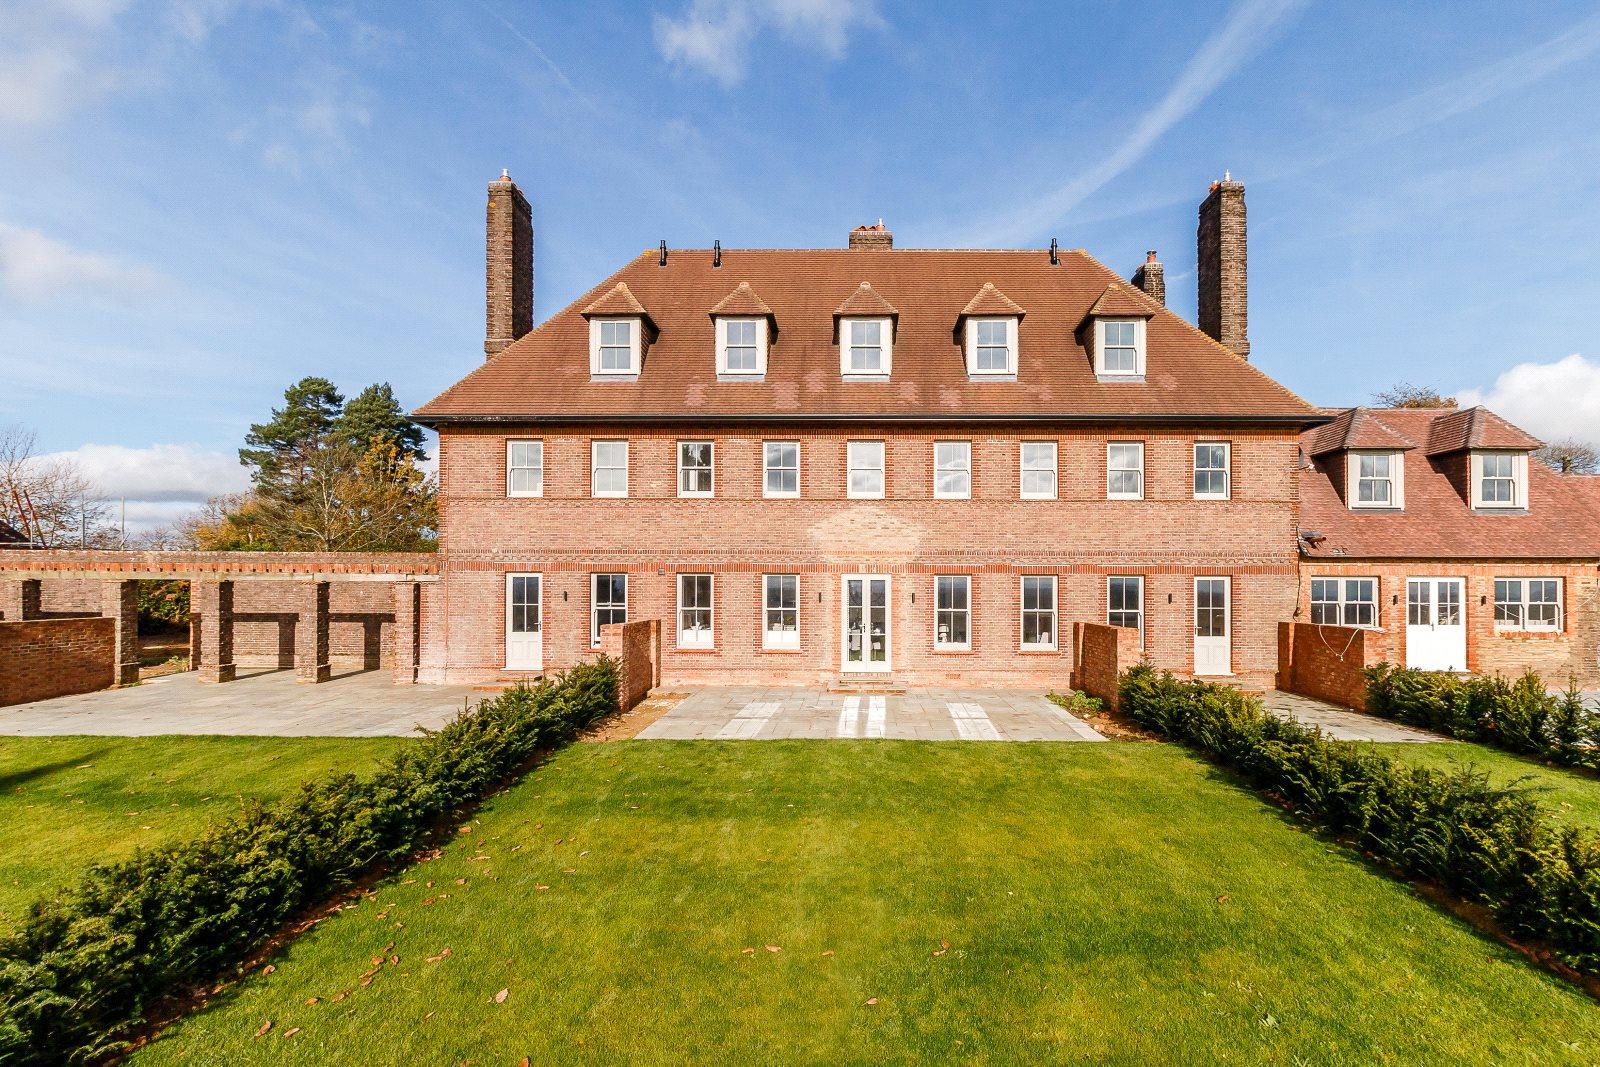 Villa per Vendita alle ore Gorse Hill, Petworth Road, Wormley, Godalming, GU8 Godalming, Inghilterra